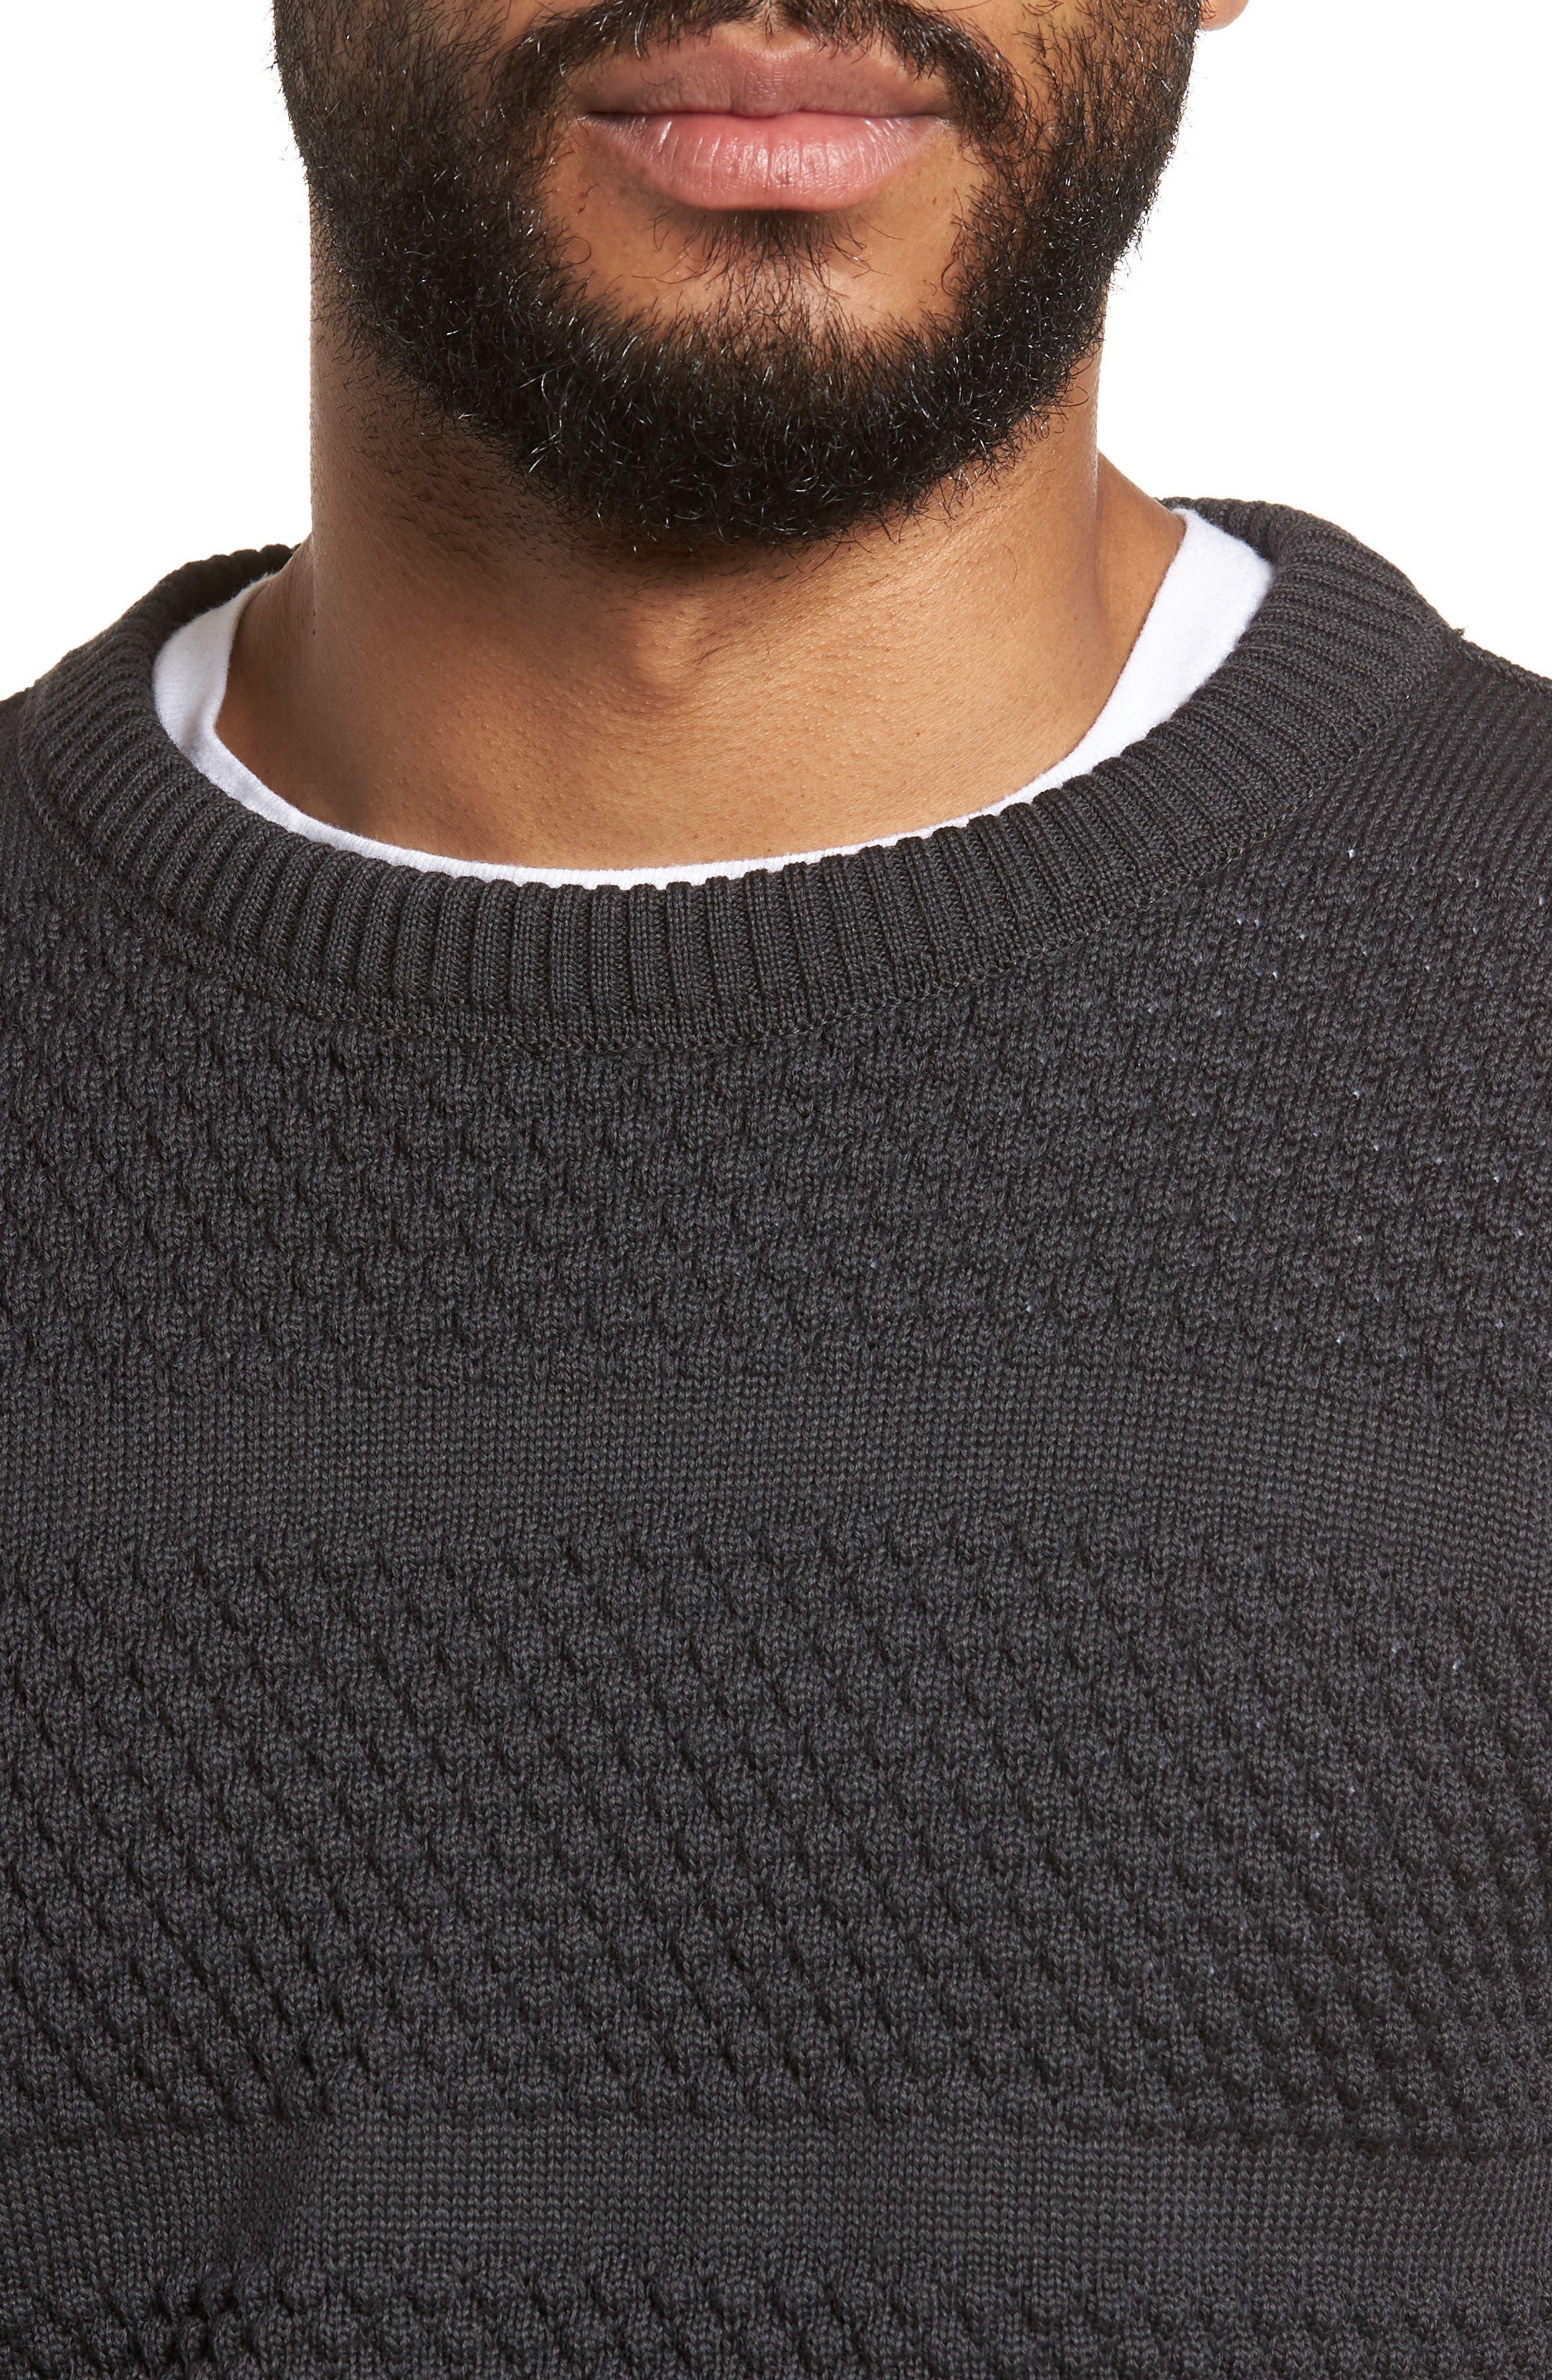 Fisherman Crewneck Wool Sweater,                             Alternate thumbnail 4, color,                             020